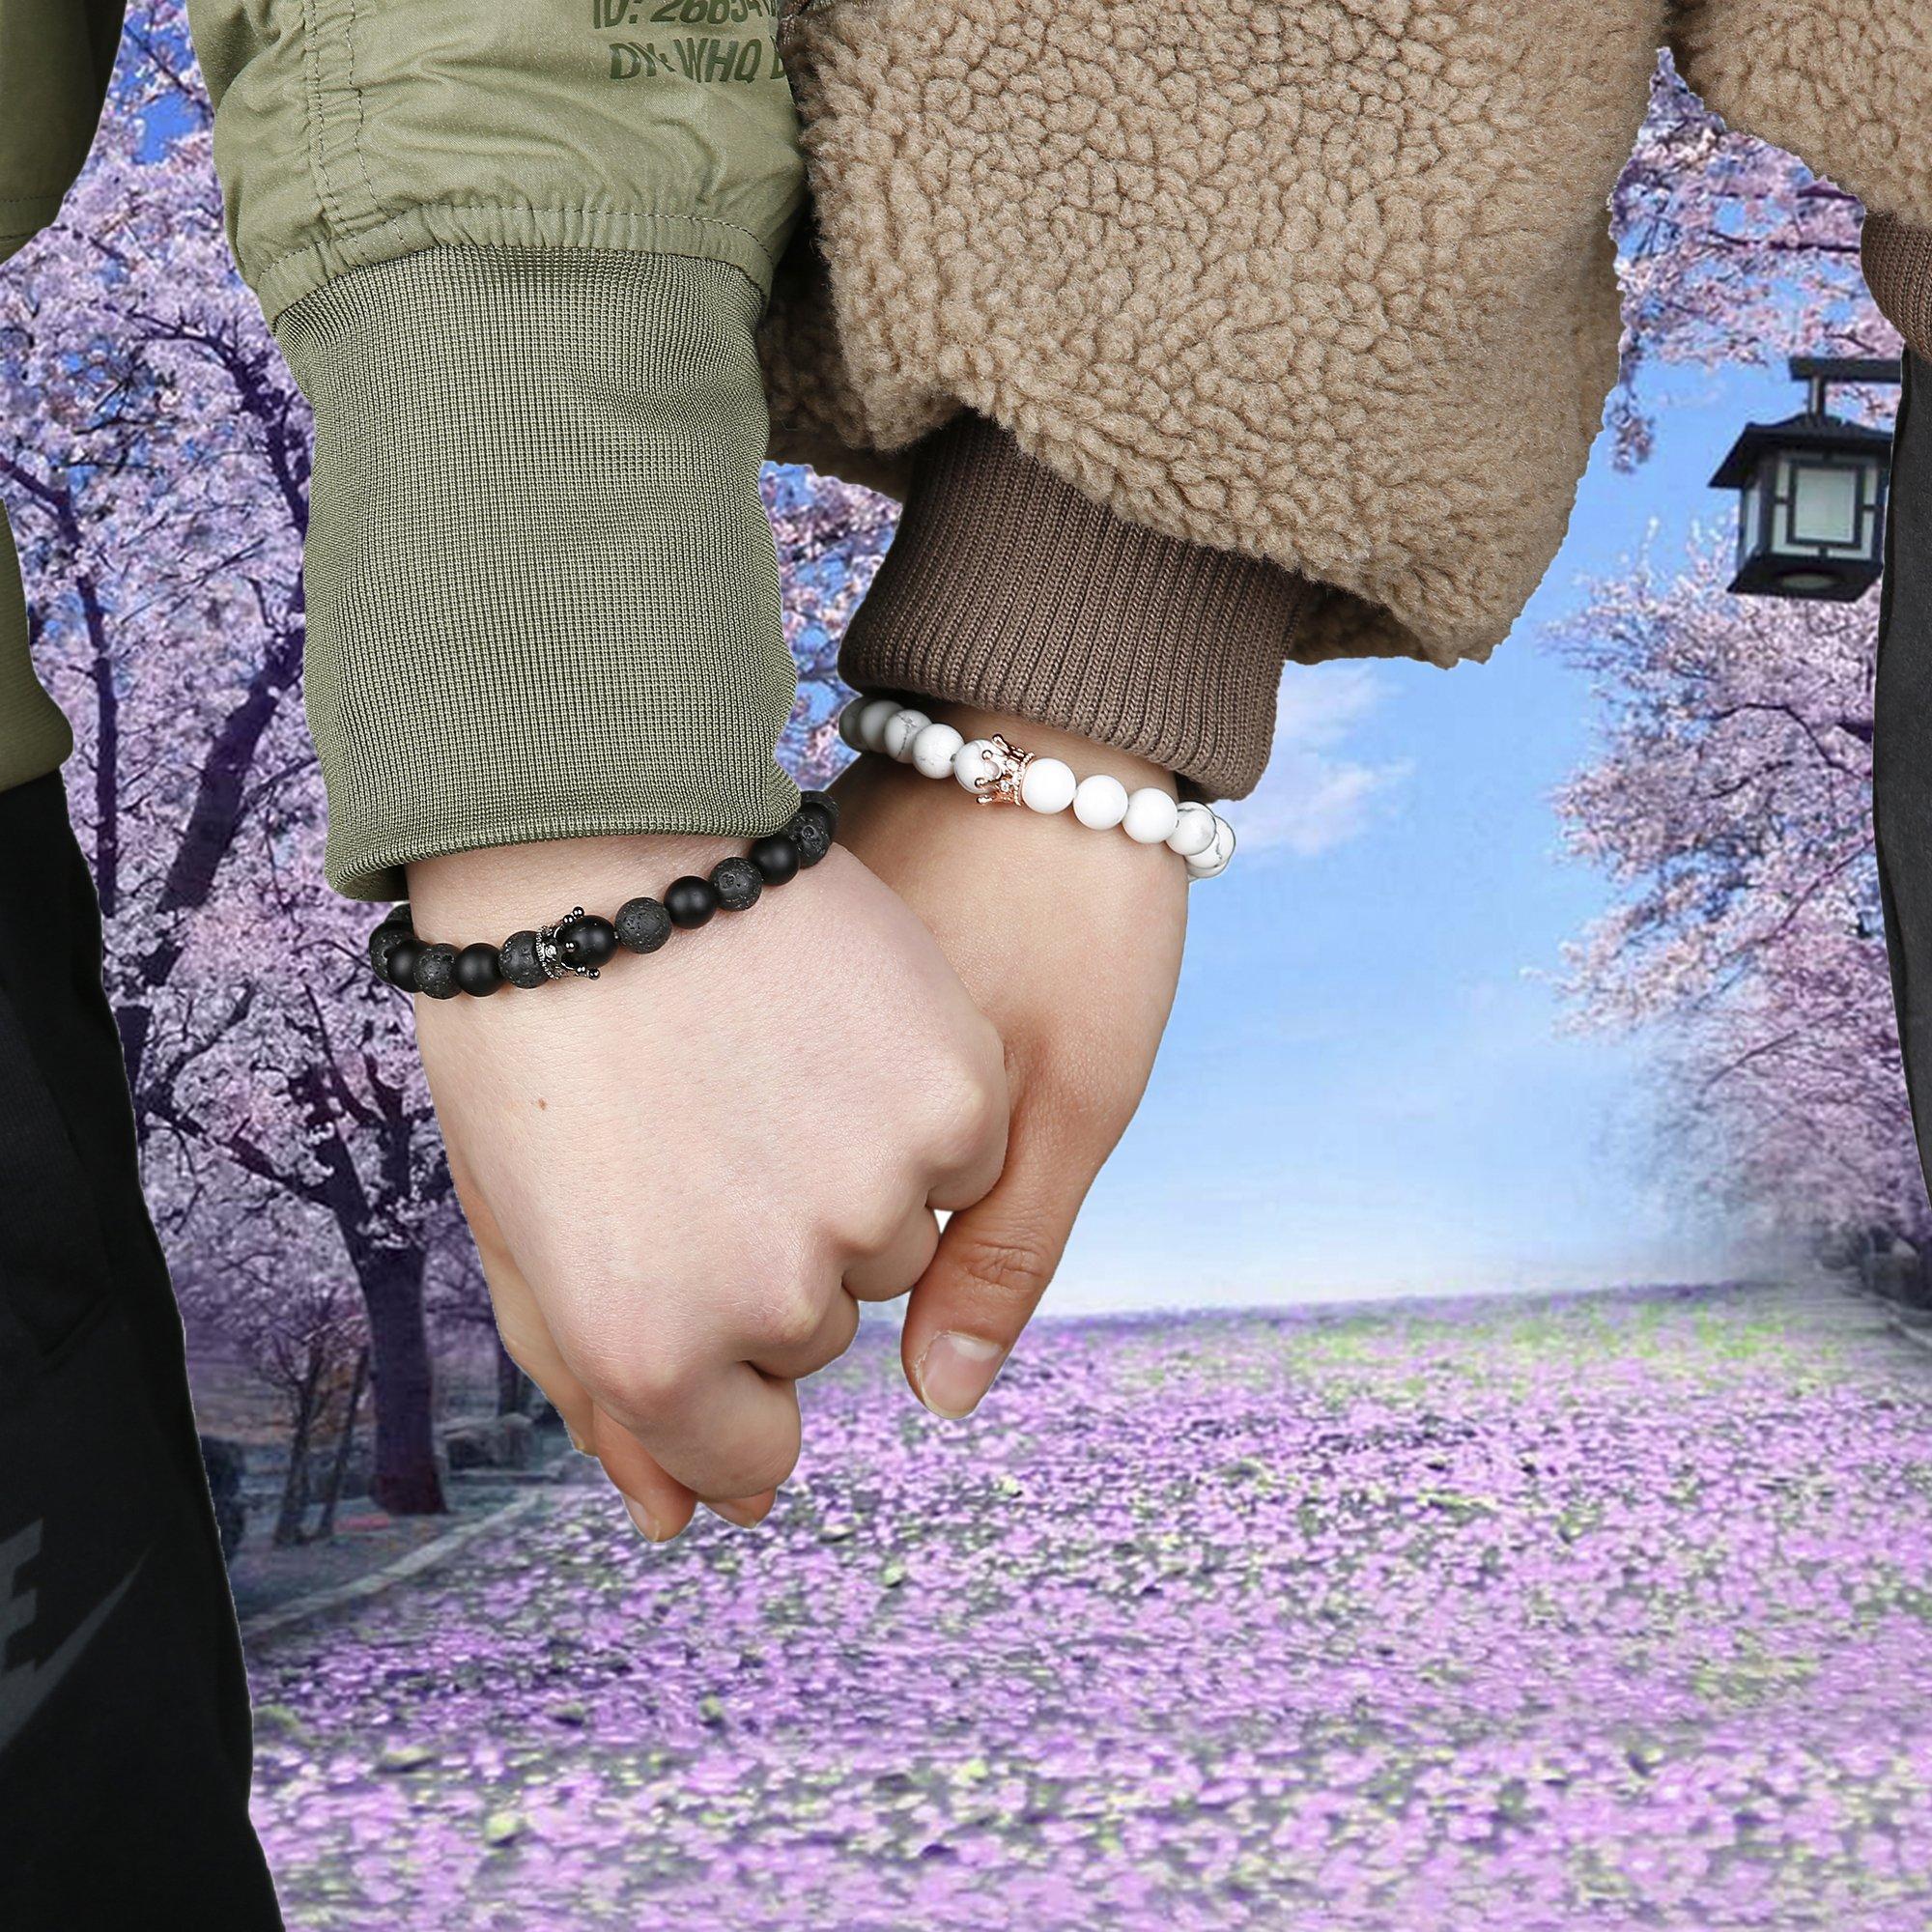 FIBO STEEL 4 Pcs Couples Bracelet for Men Women His & Her Crown Queen Bracelets Set 8mm Beads Bracelets by FIBO STEEL (Image #6)